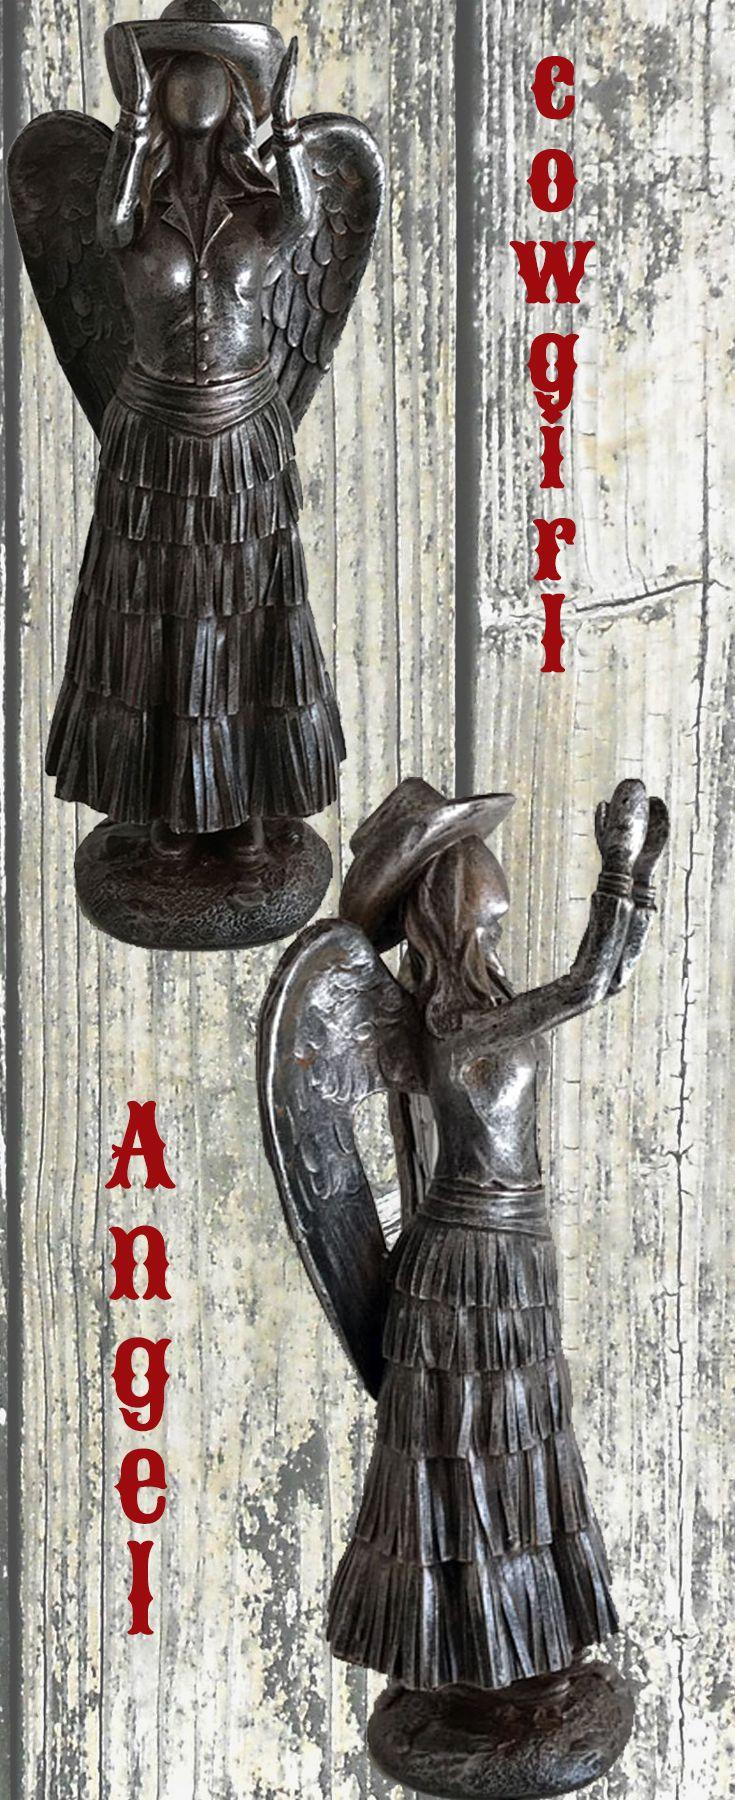 Cowgirl Christmas Decor - Praying Cowgirl Angel Wearing Dress ...